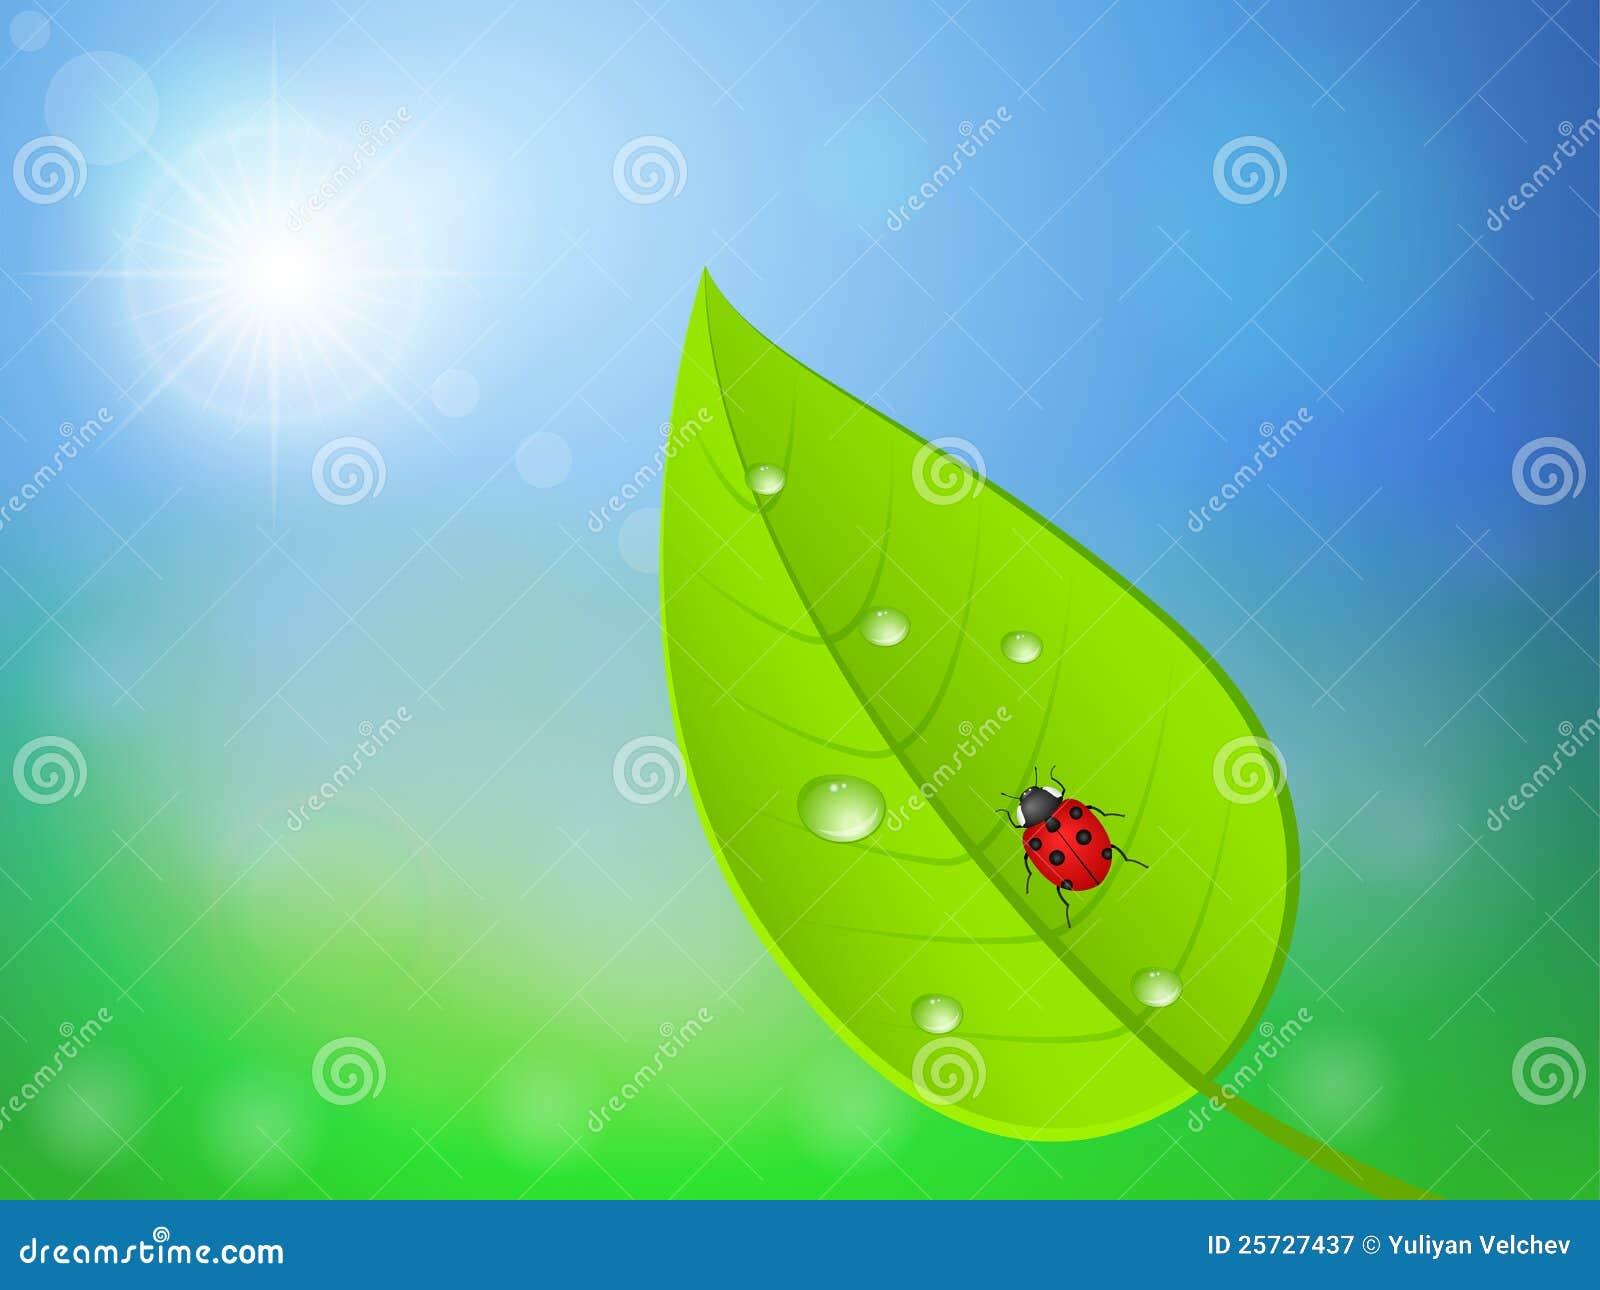 Leaf and ladybird